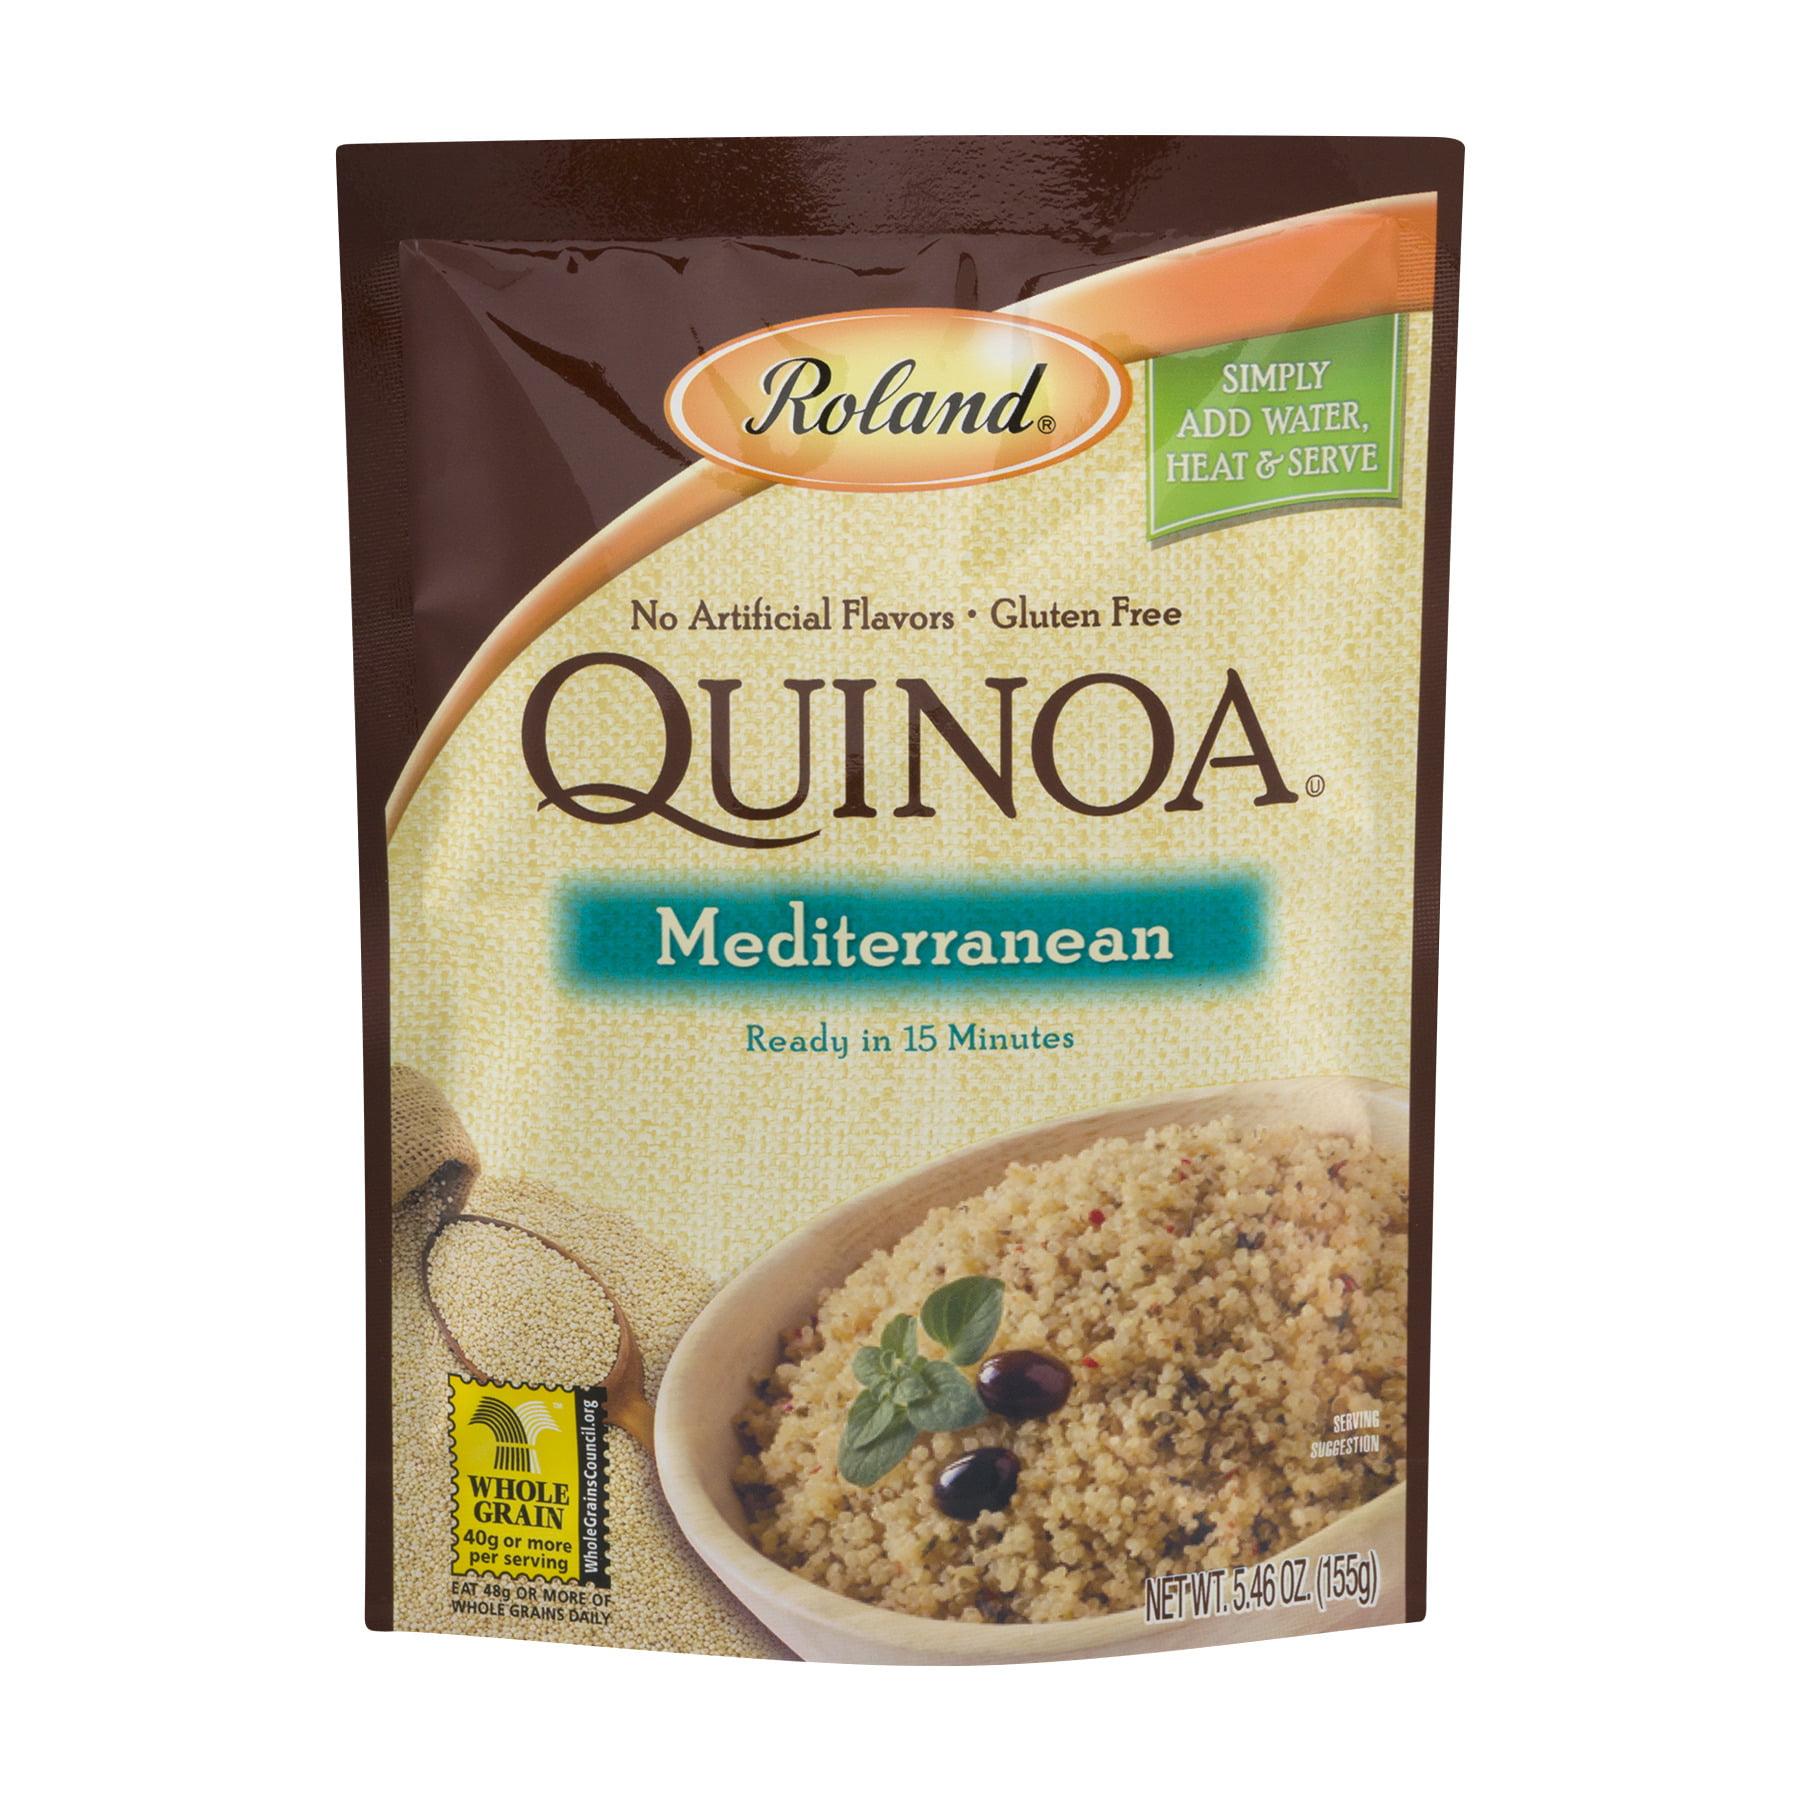 (2 Pack) Roland Mediterranean Quinoa, 5.46 oz